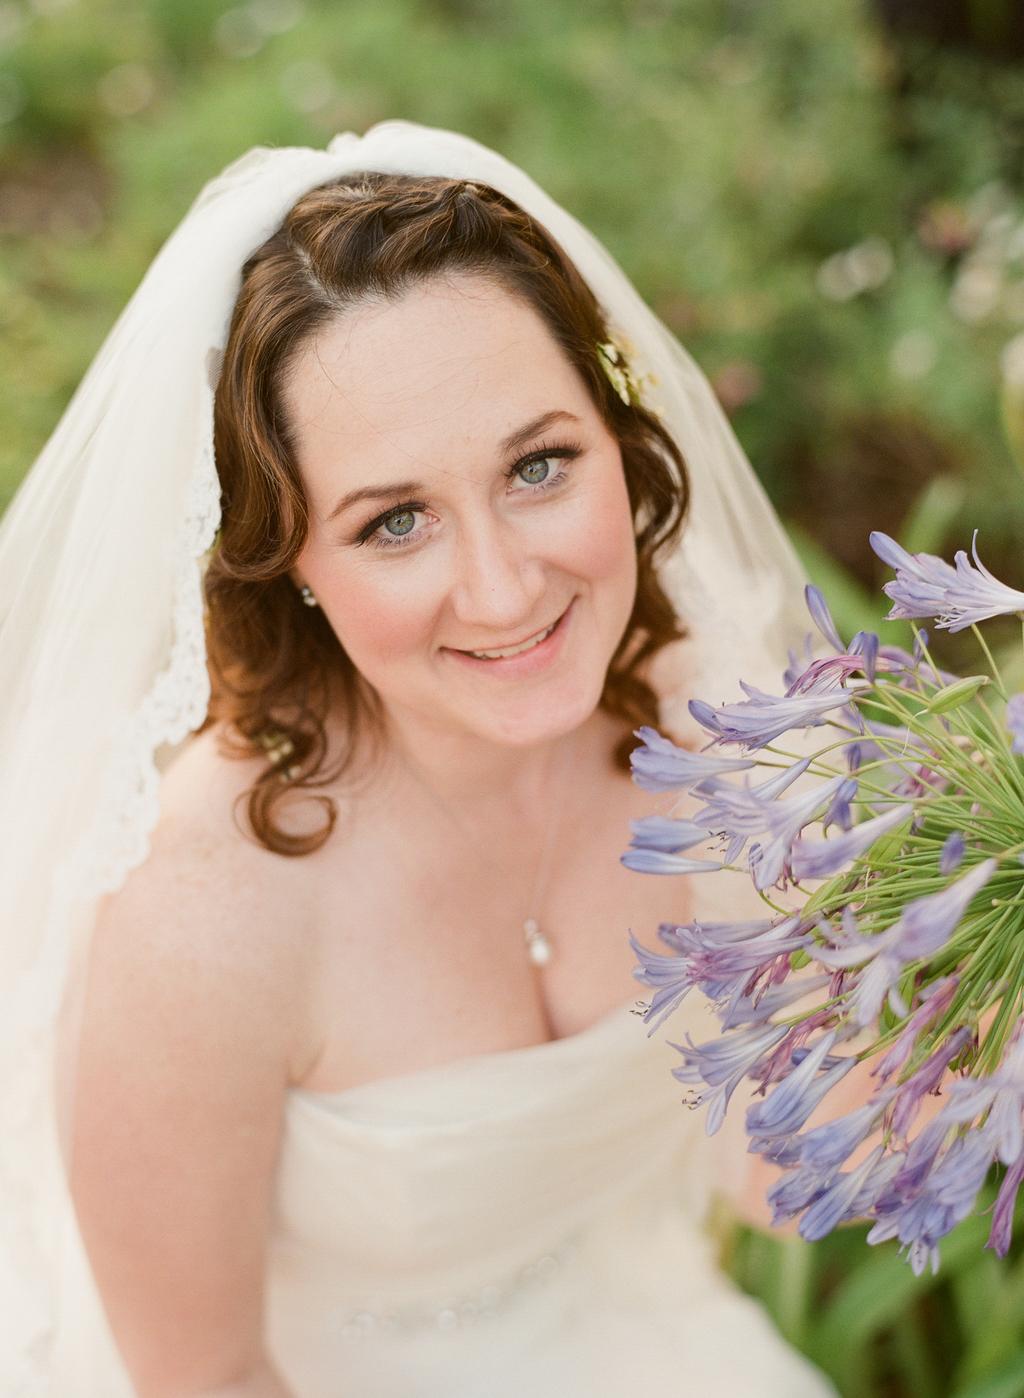 Santa-barbara-chic-beaux-arts-photography-romantic-wedding-inspiration-glam-midsummer-nights-dream-themed-weddings-bride-006.full